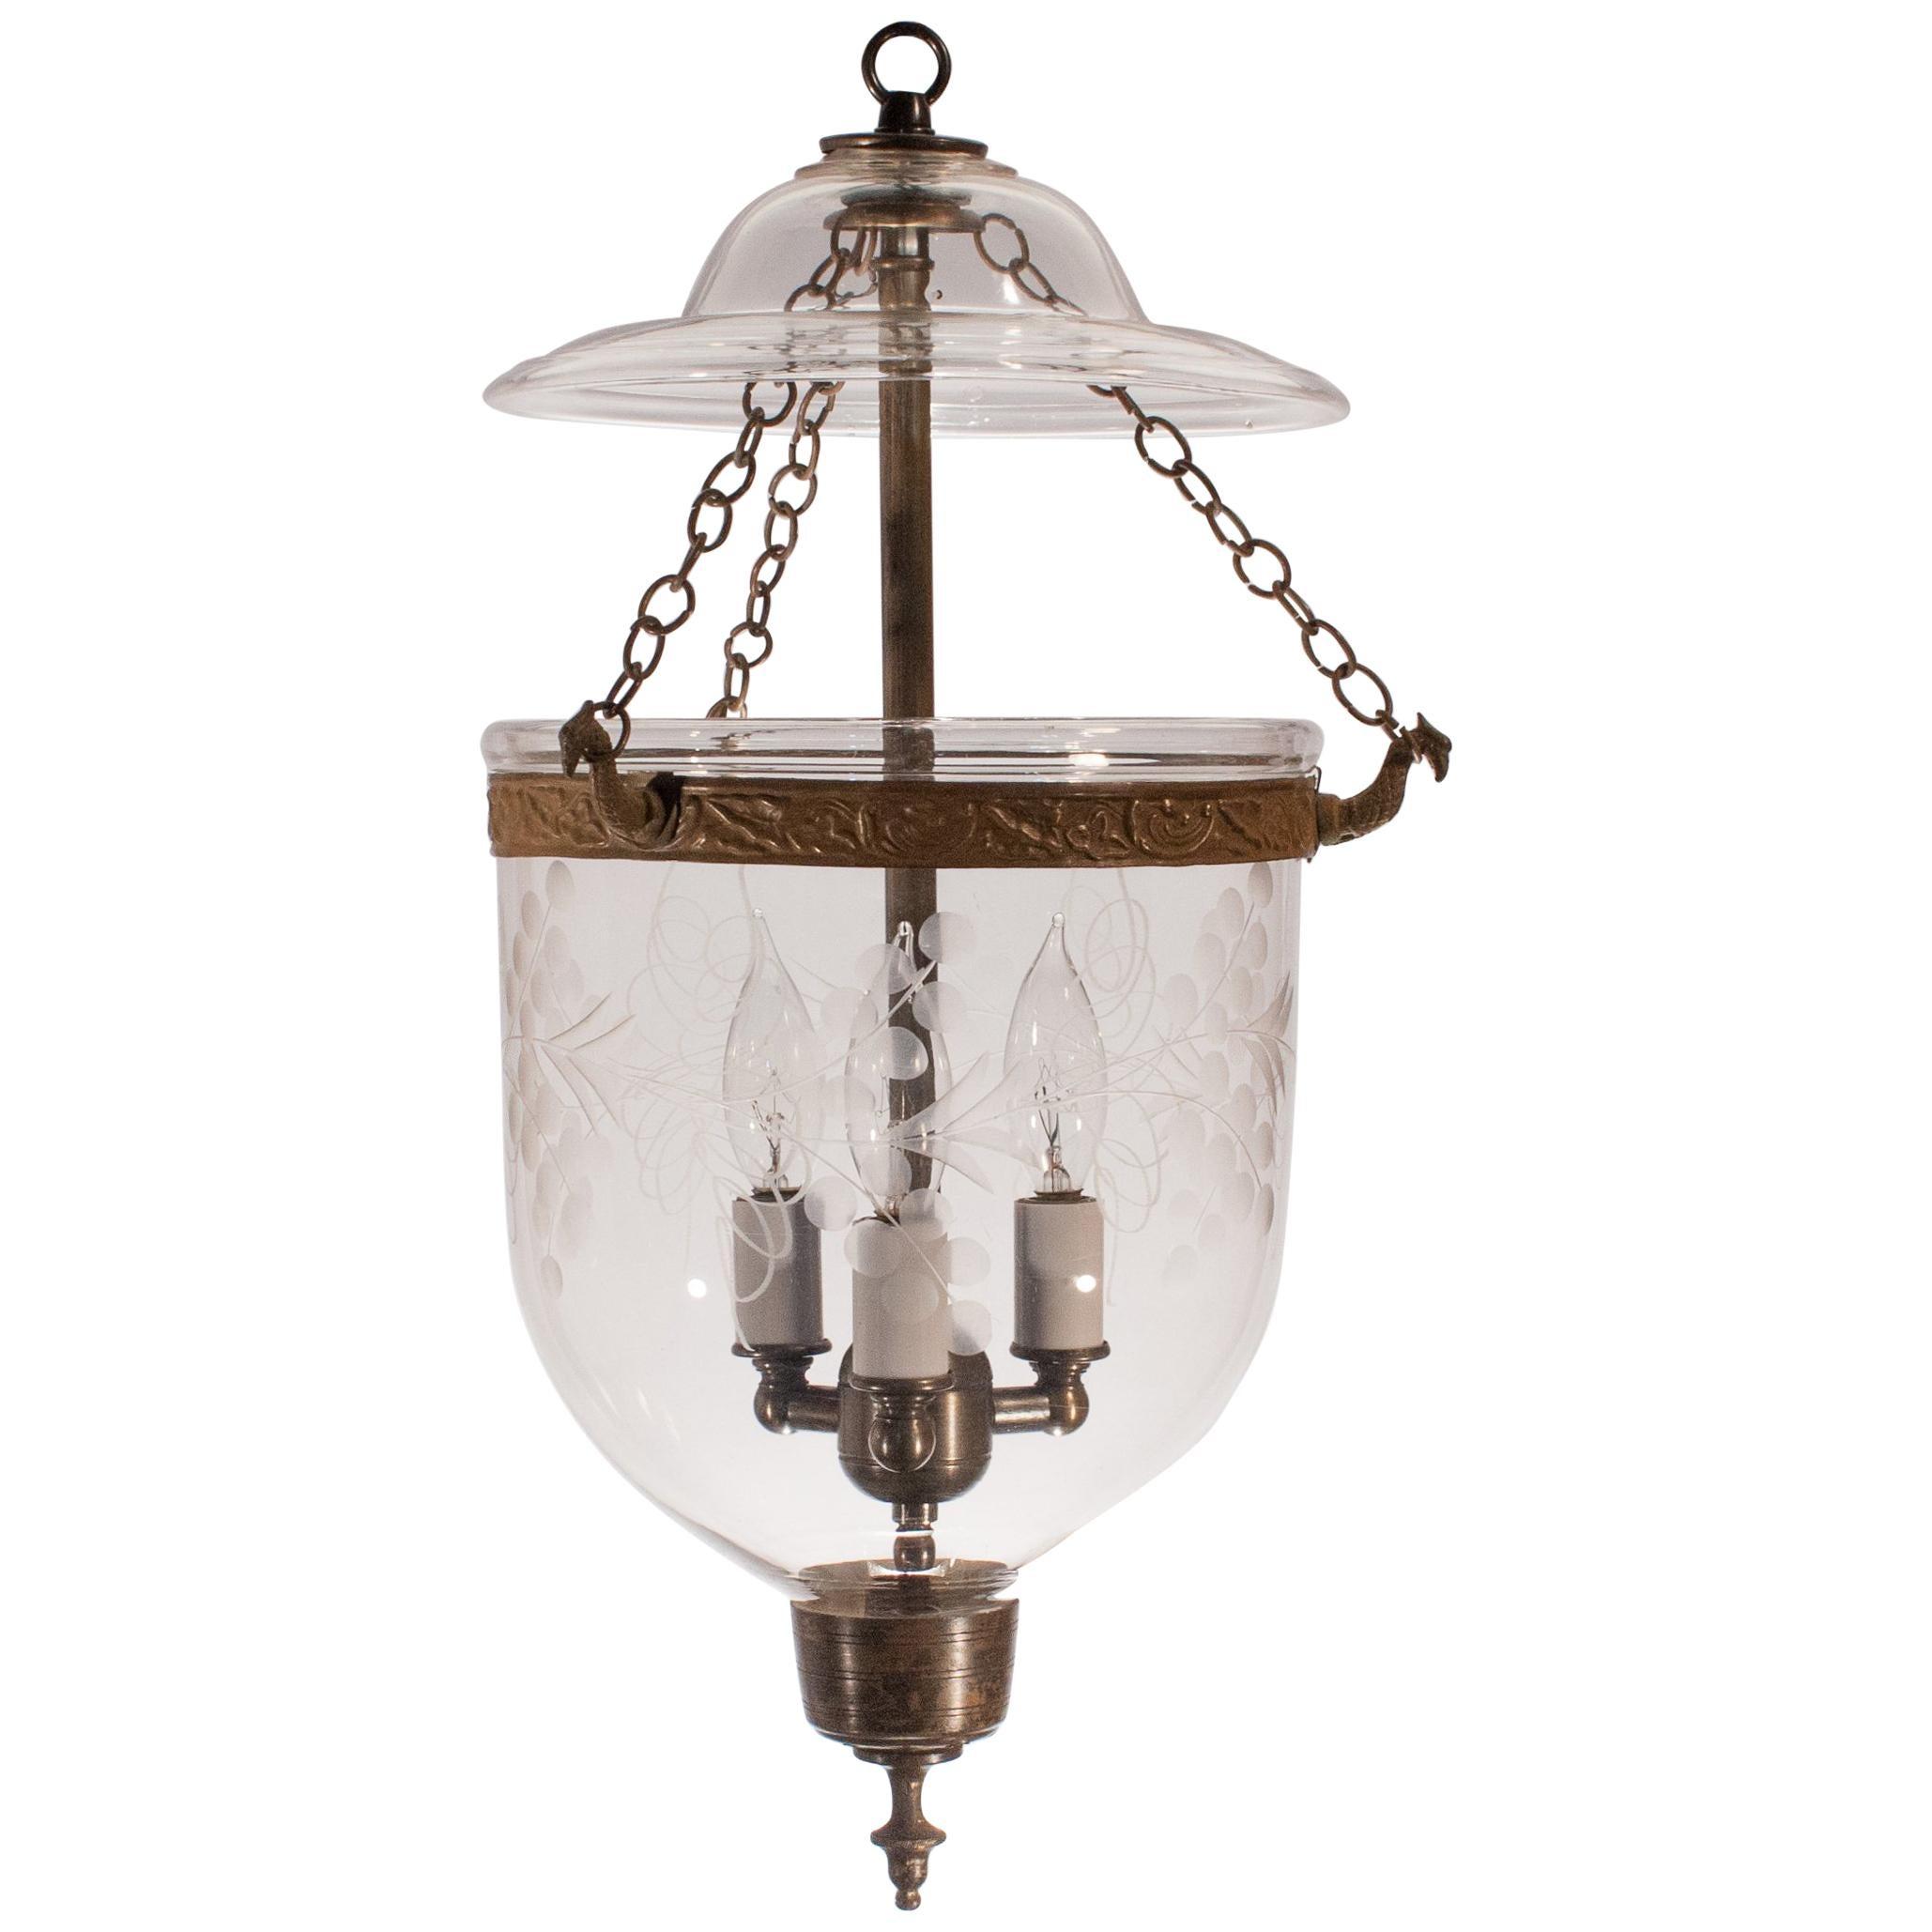 Petite Bell Jar Lantern with Vine Etching